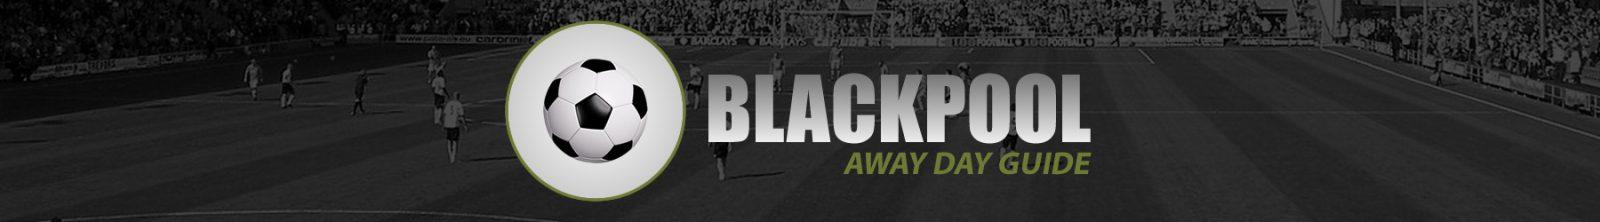 Blackpool Away